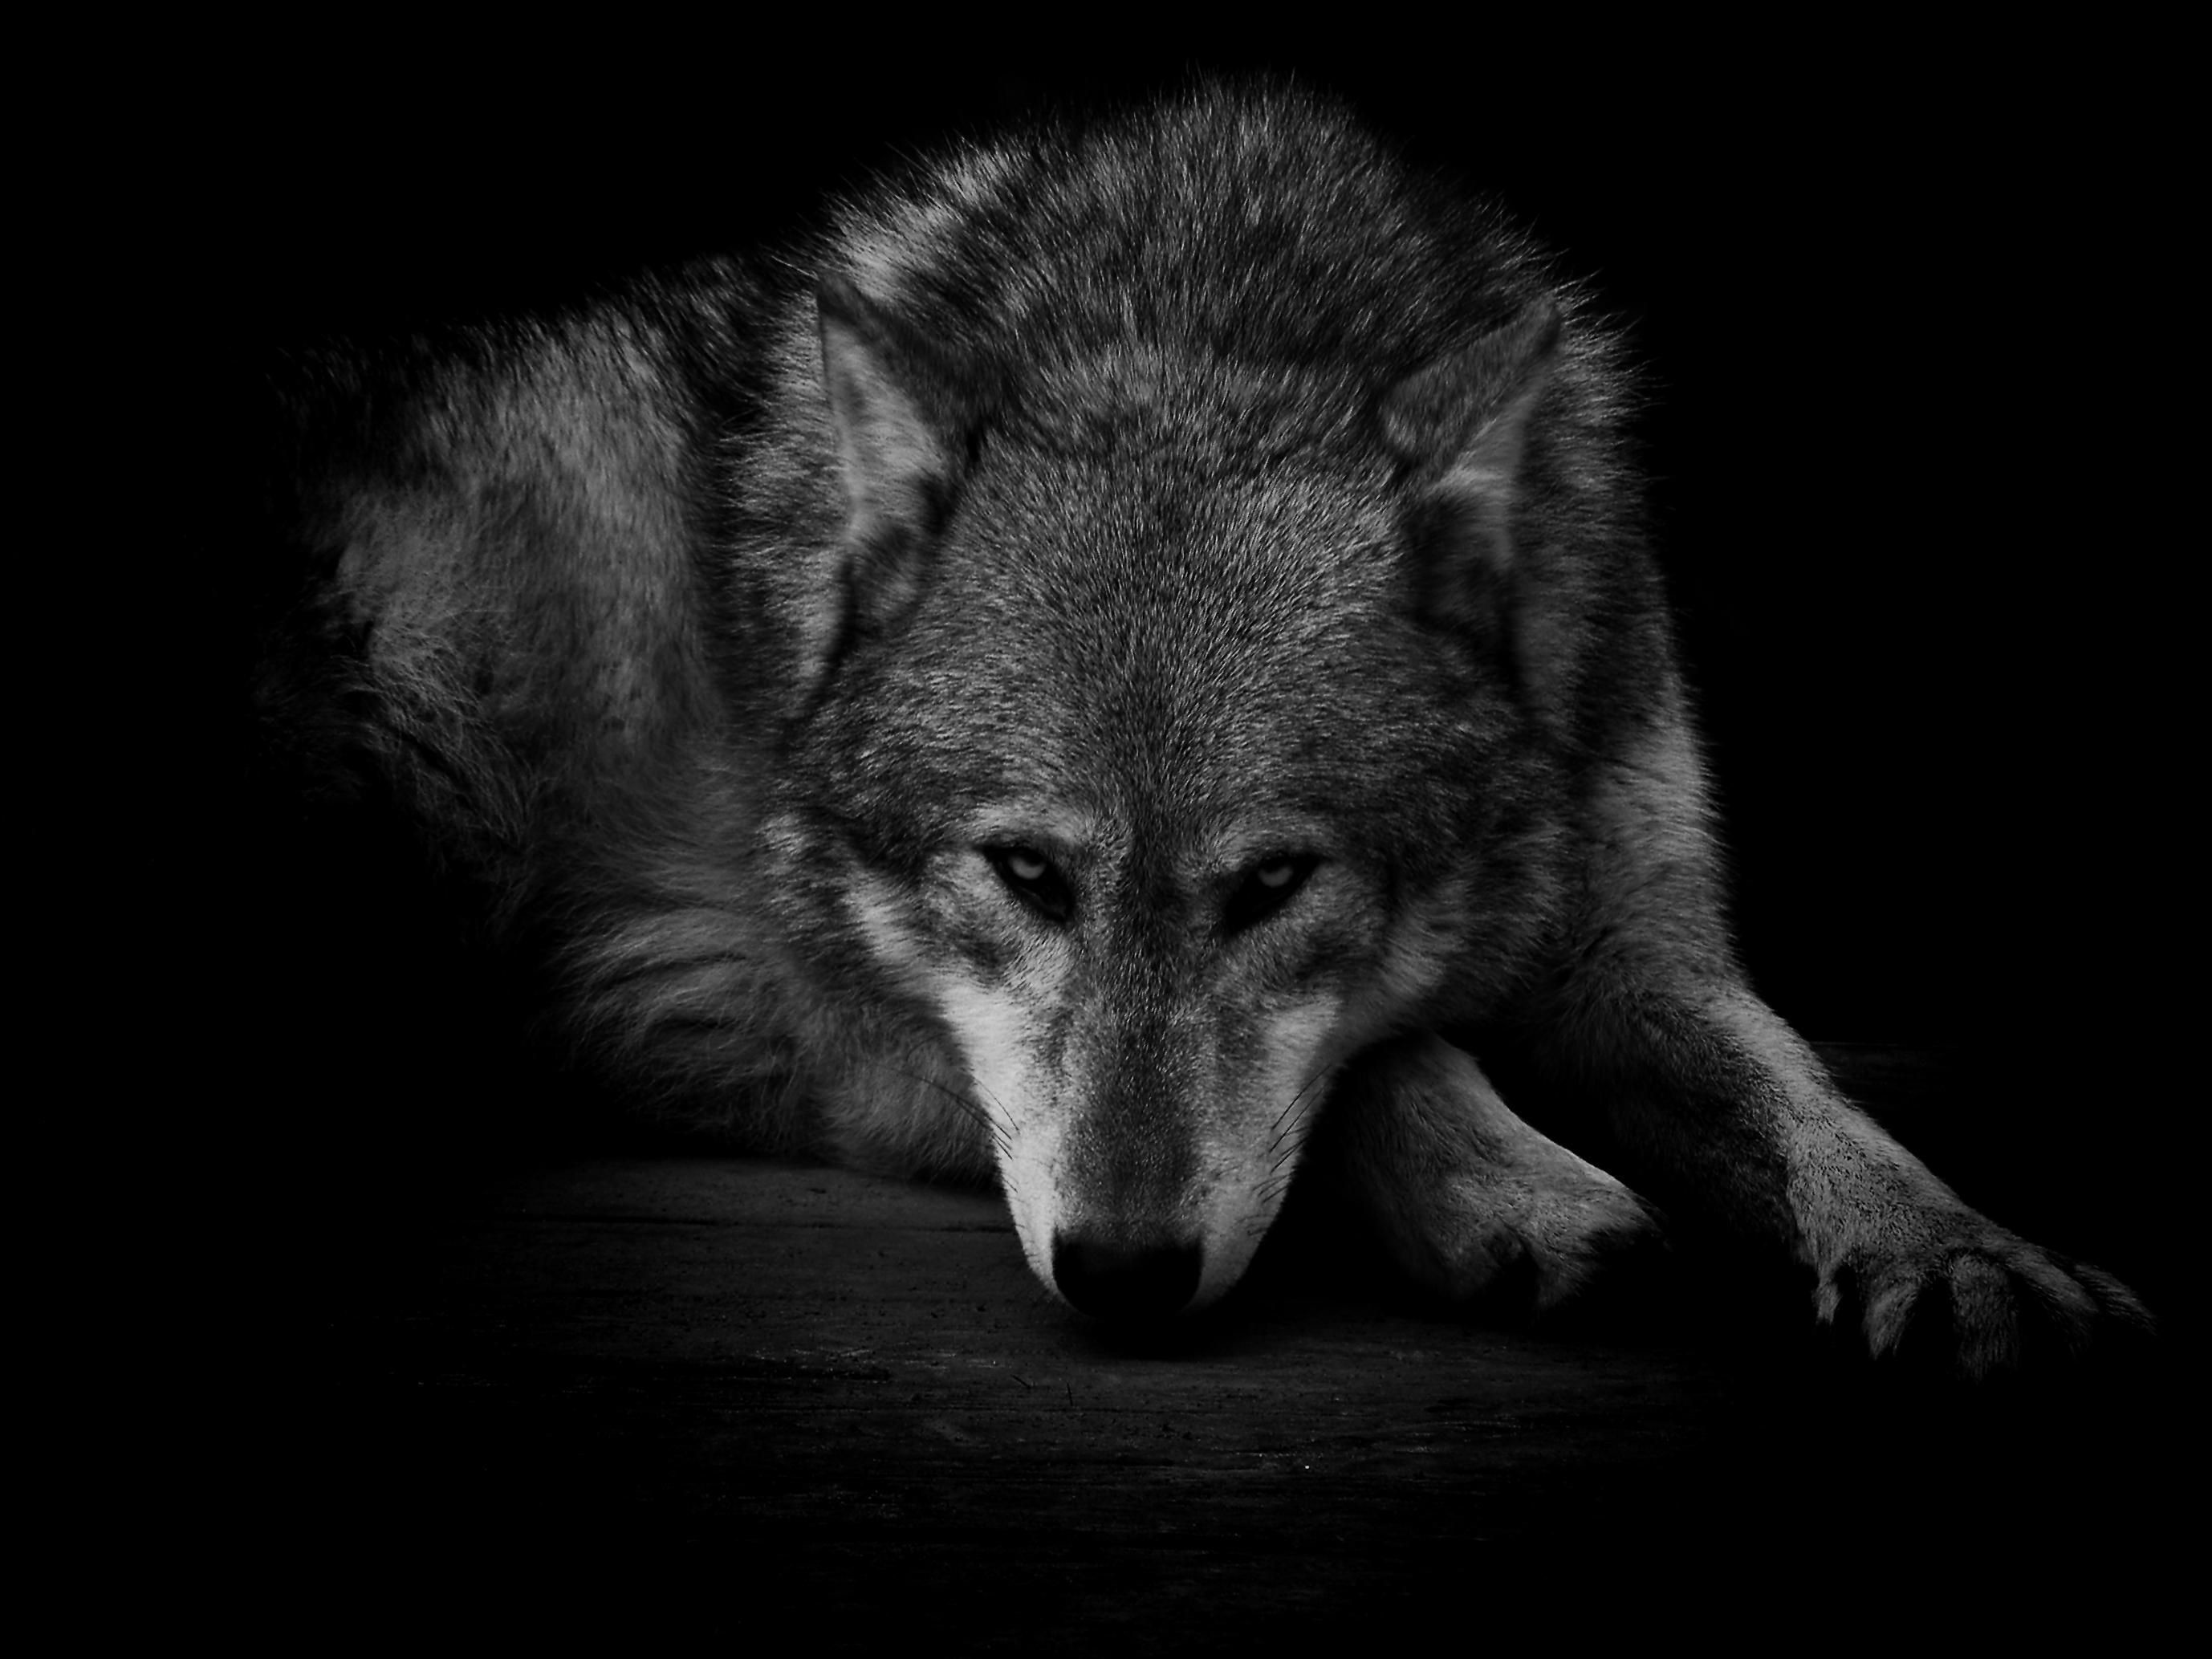 GRAY WOLF WALLPAPER – (#80742) – HD Wallpapers – [wallpapersinhq.pw